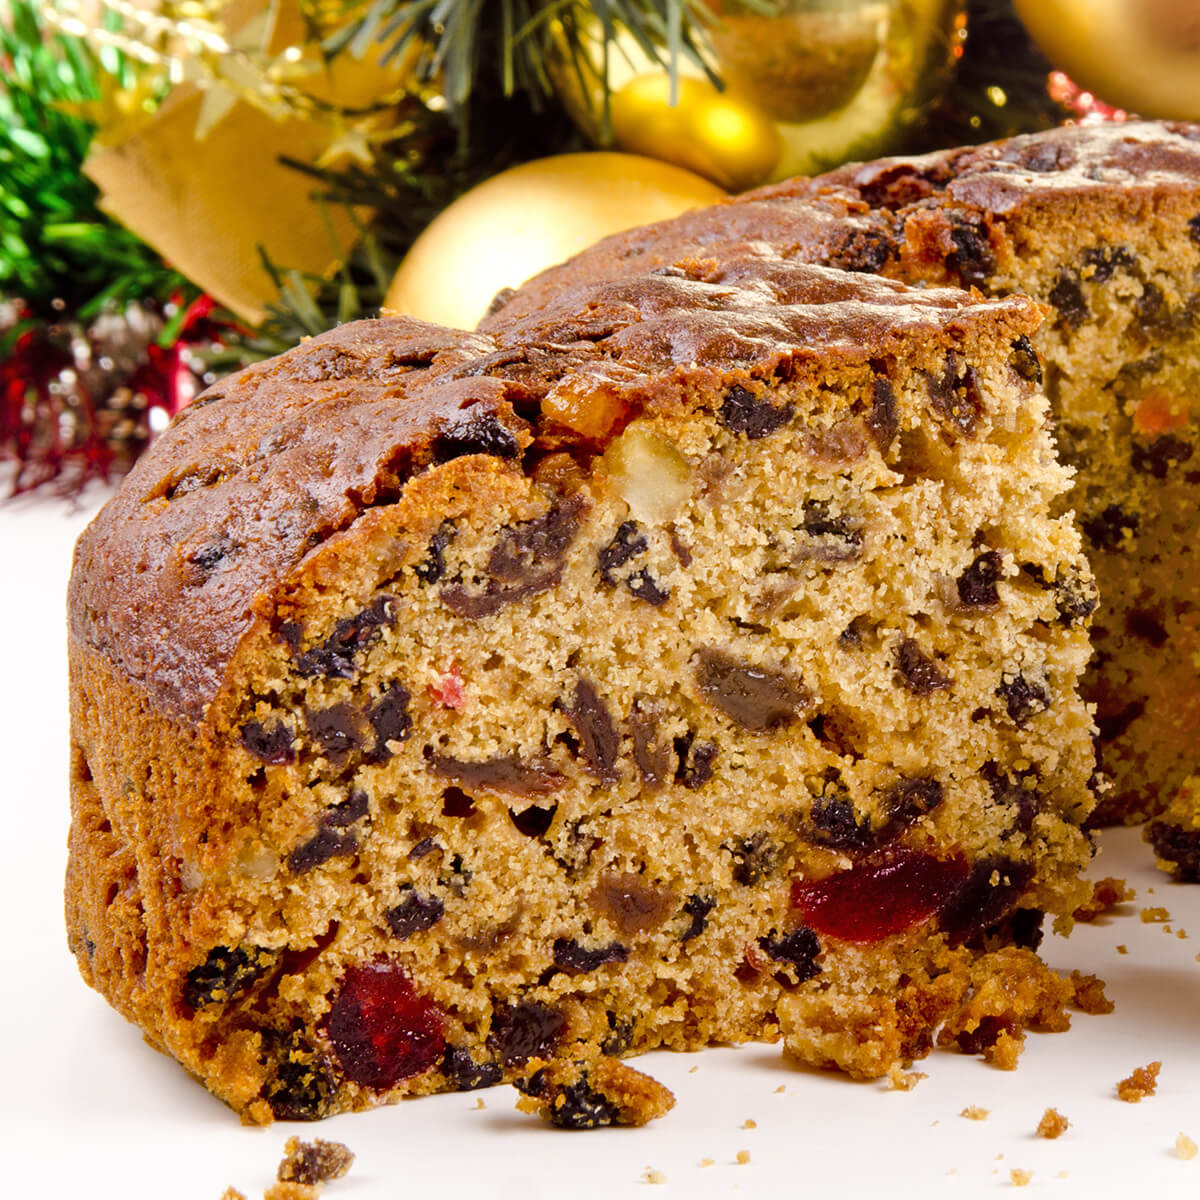 fruit cake is one of the 21 Best Vegan Christmas Dinner Recipes